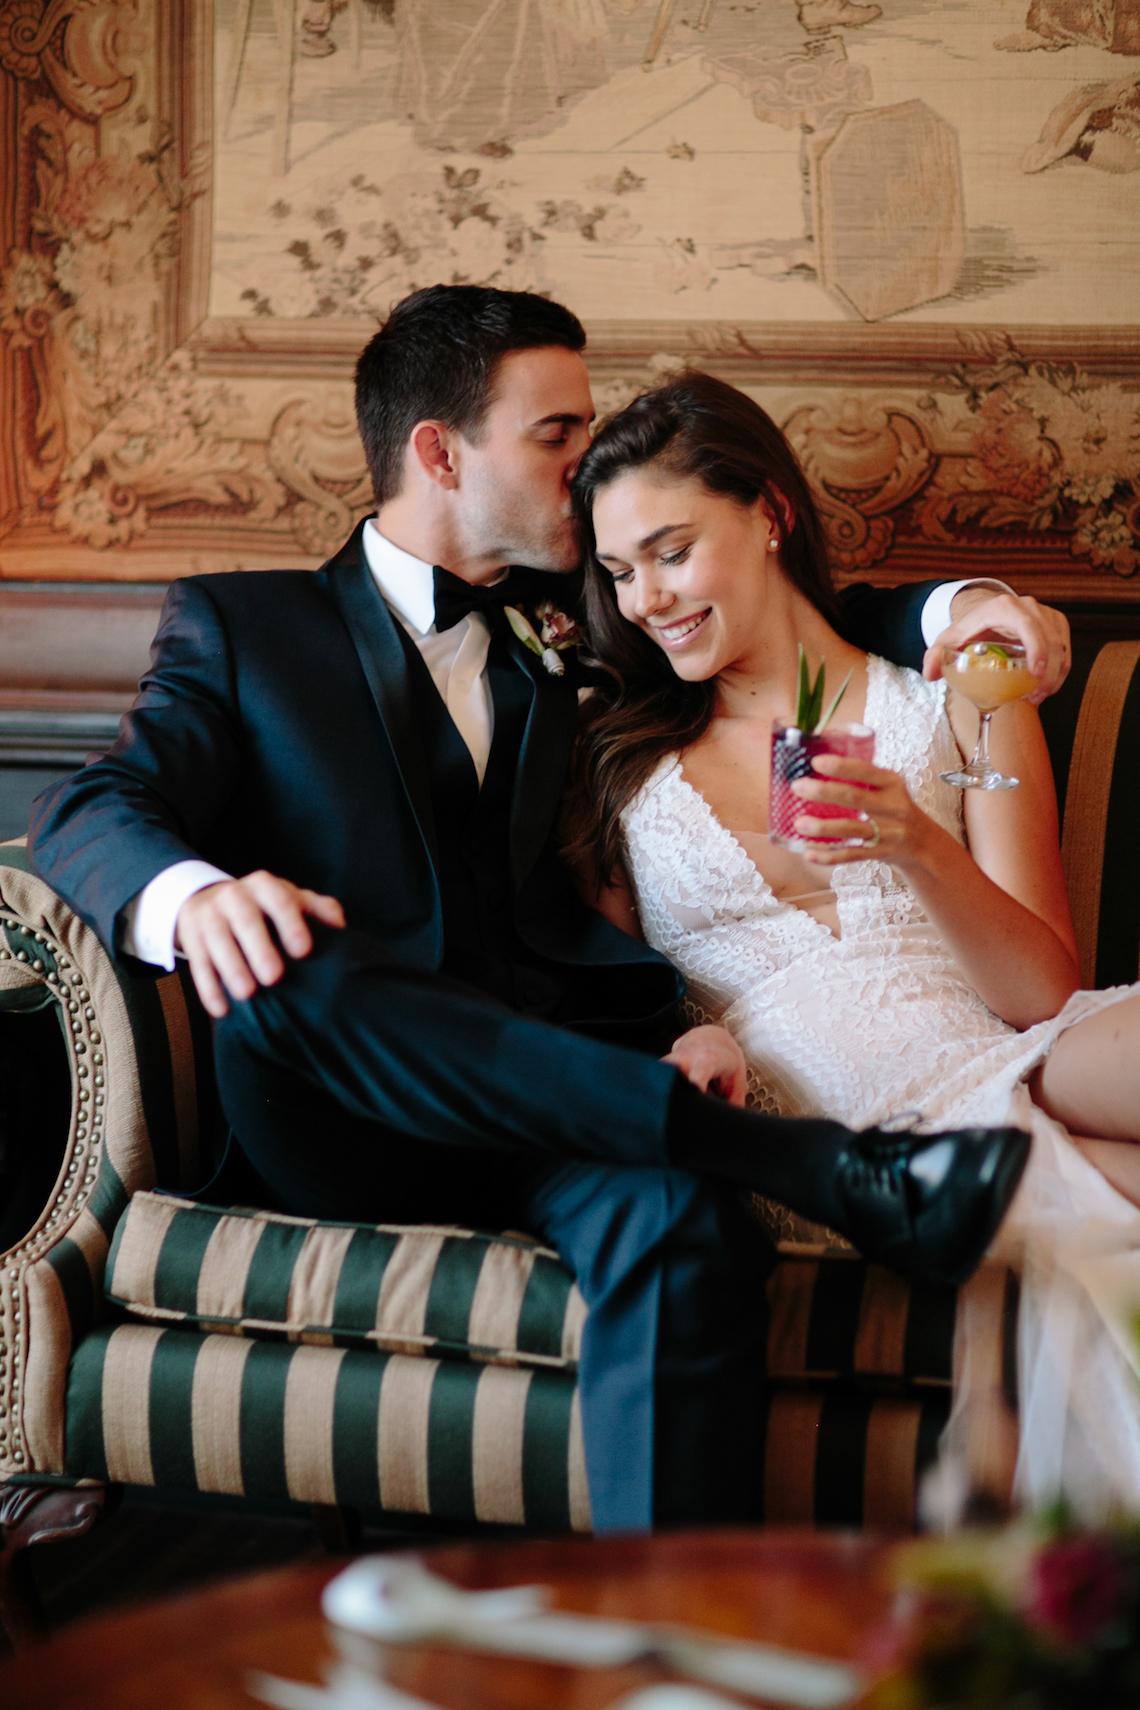 Romantic, Spanish, Hemingway Inspired Wedding Style | All in Love Design by Anna Lisa | Scott Sikora 74